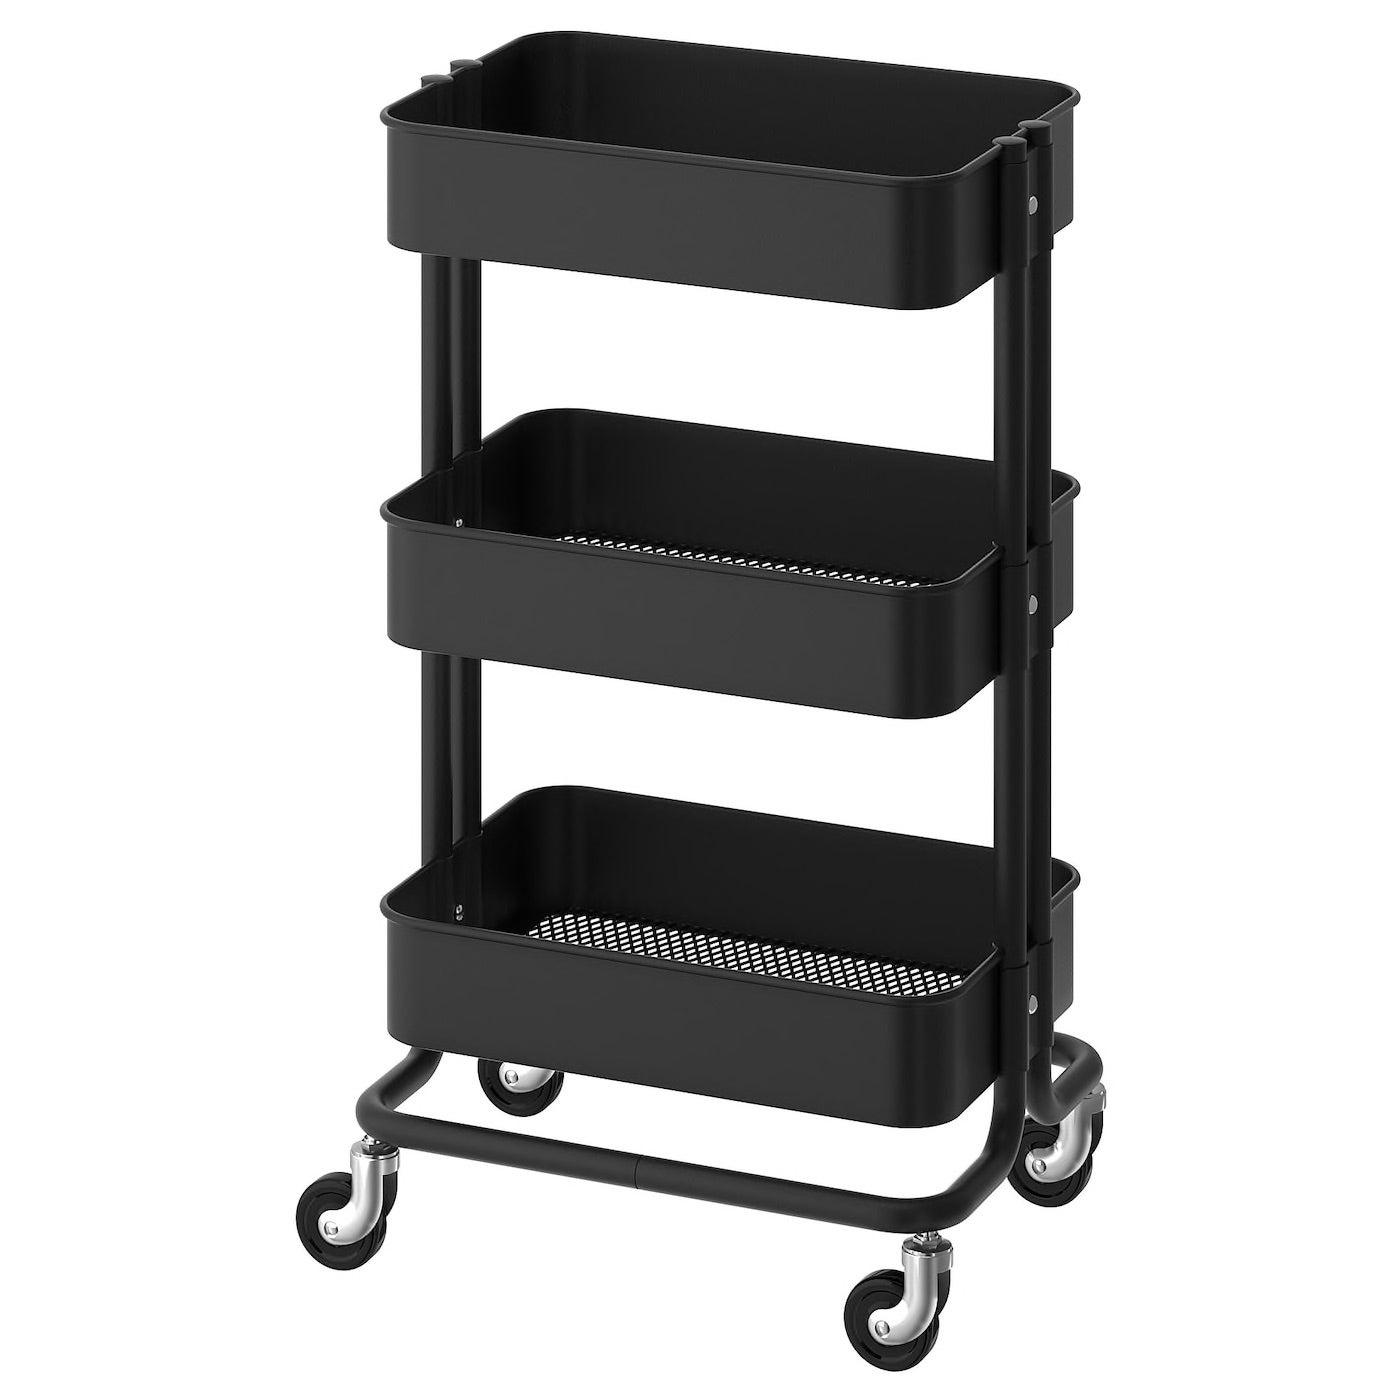 Black utility cart